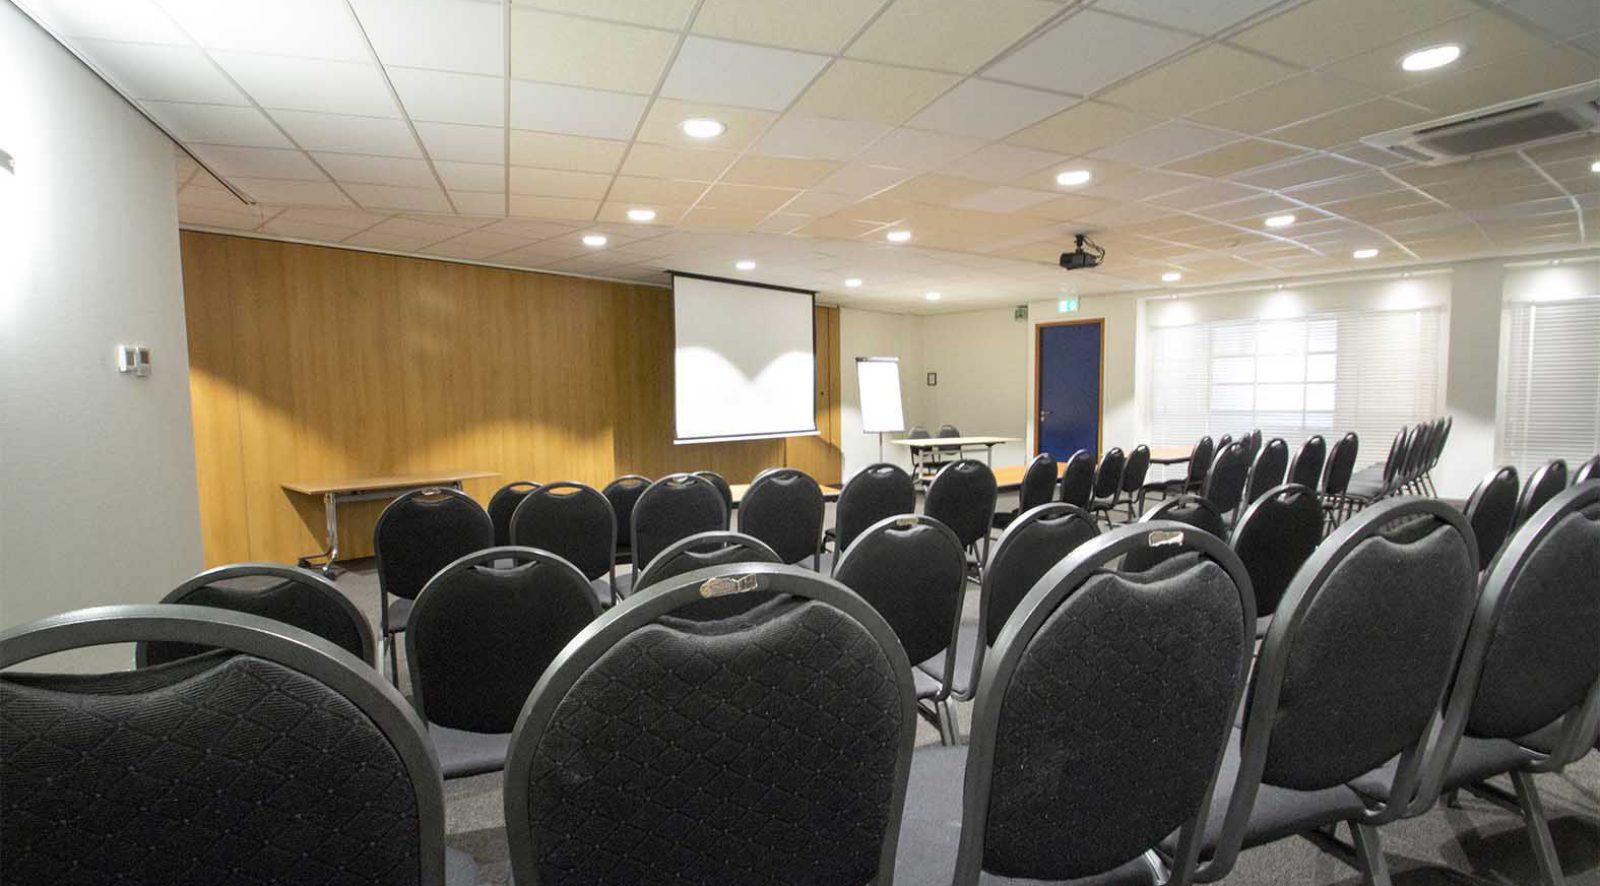 Vergaderlocatie Haarlem | Crown Business Center Haarlem | Office & Meetings